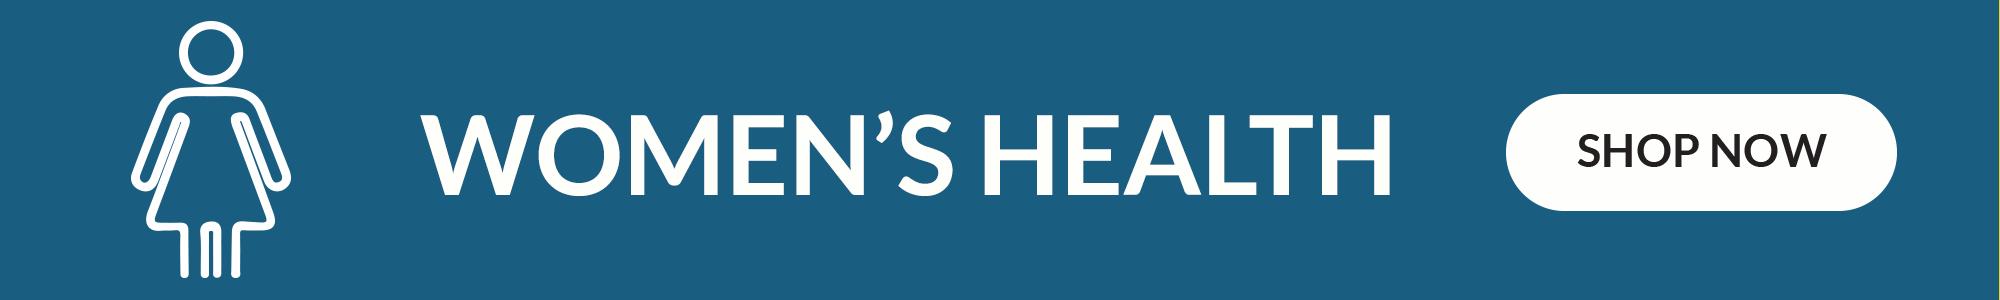 womens-health-header.png